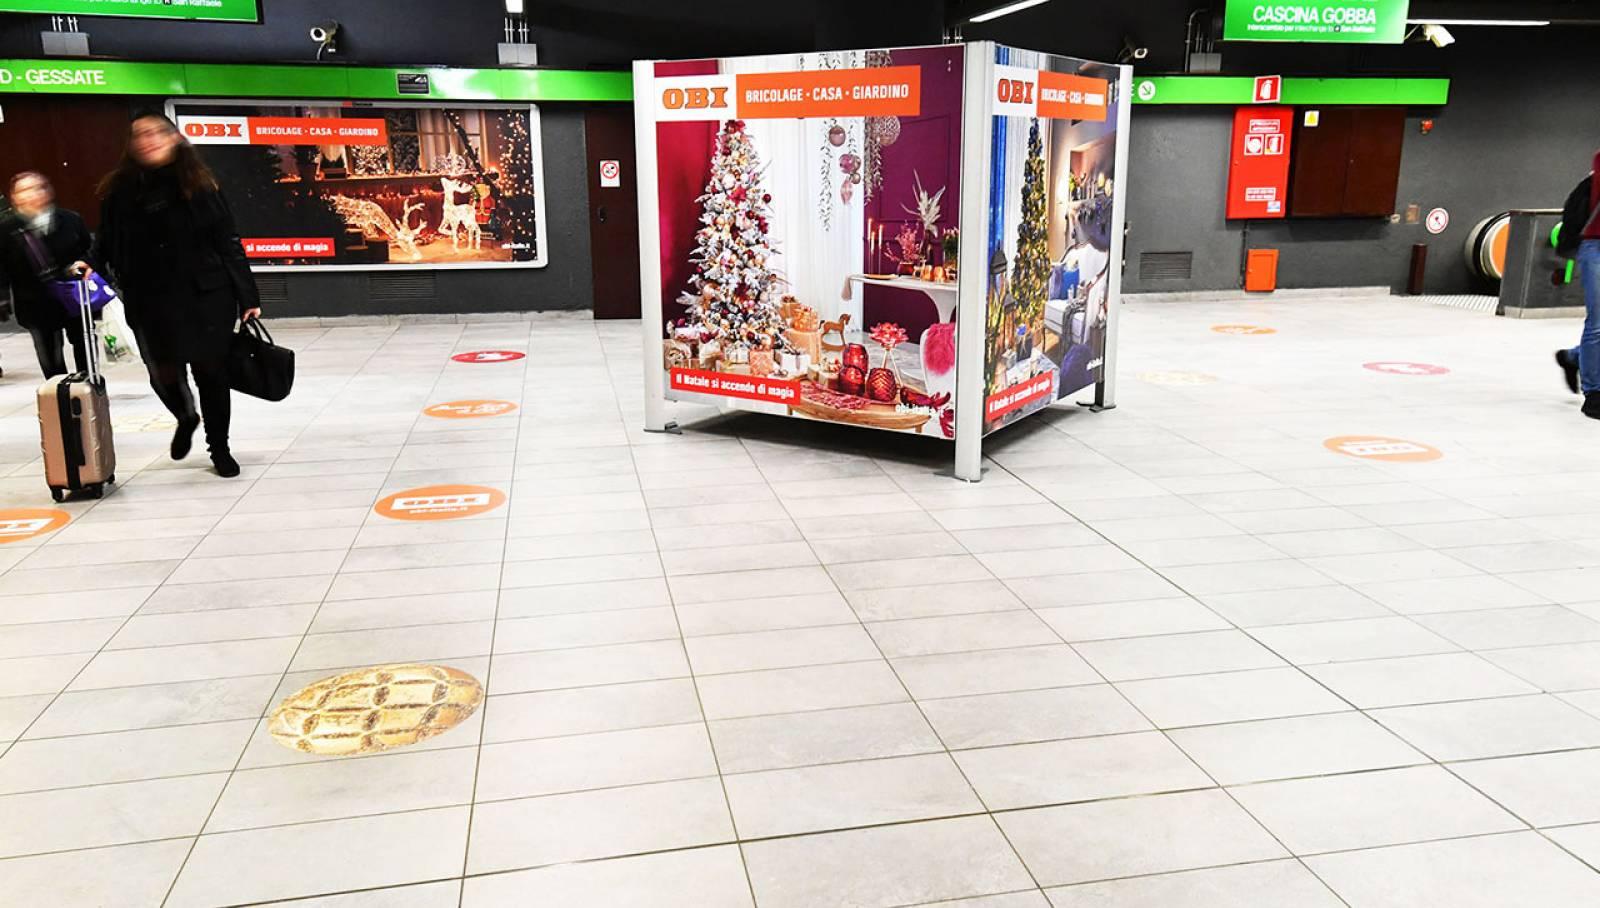 OOH IGPDecaux Milano Station Domination per OBI Italia Milano Centrale